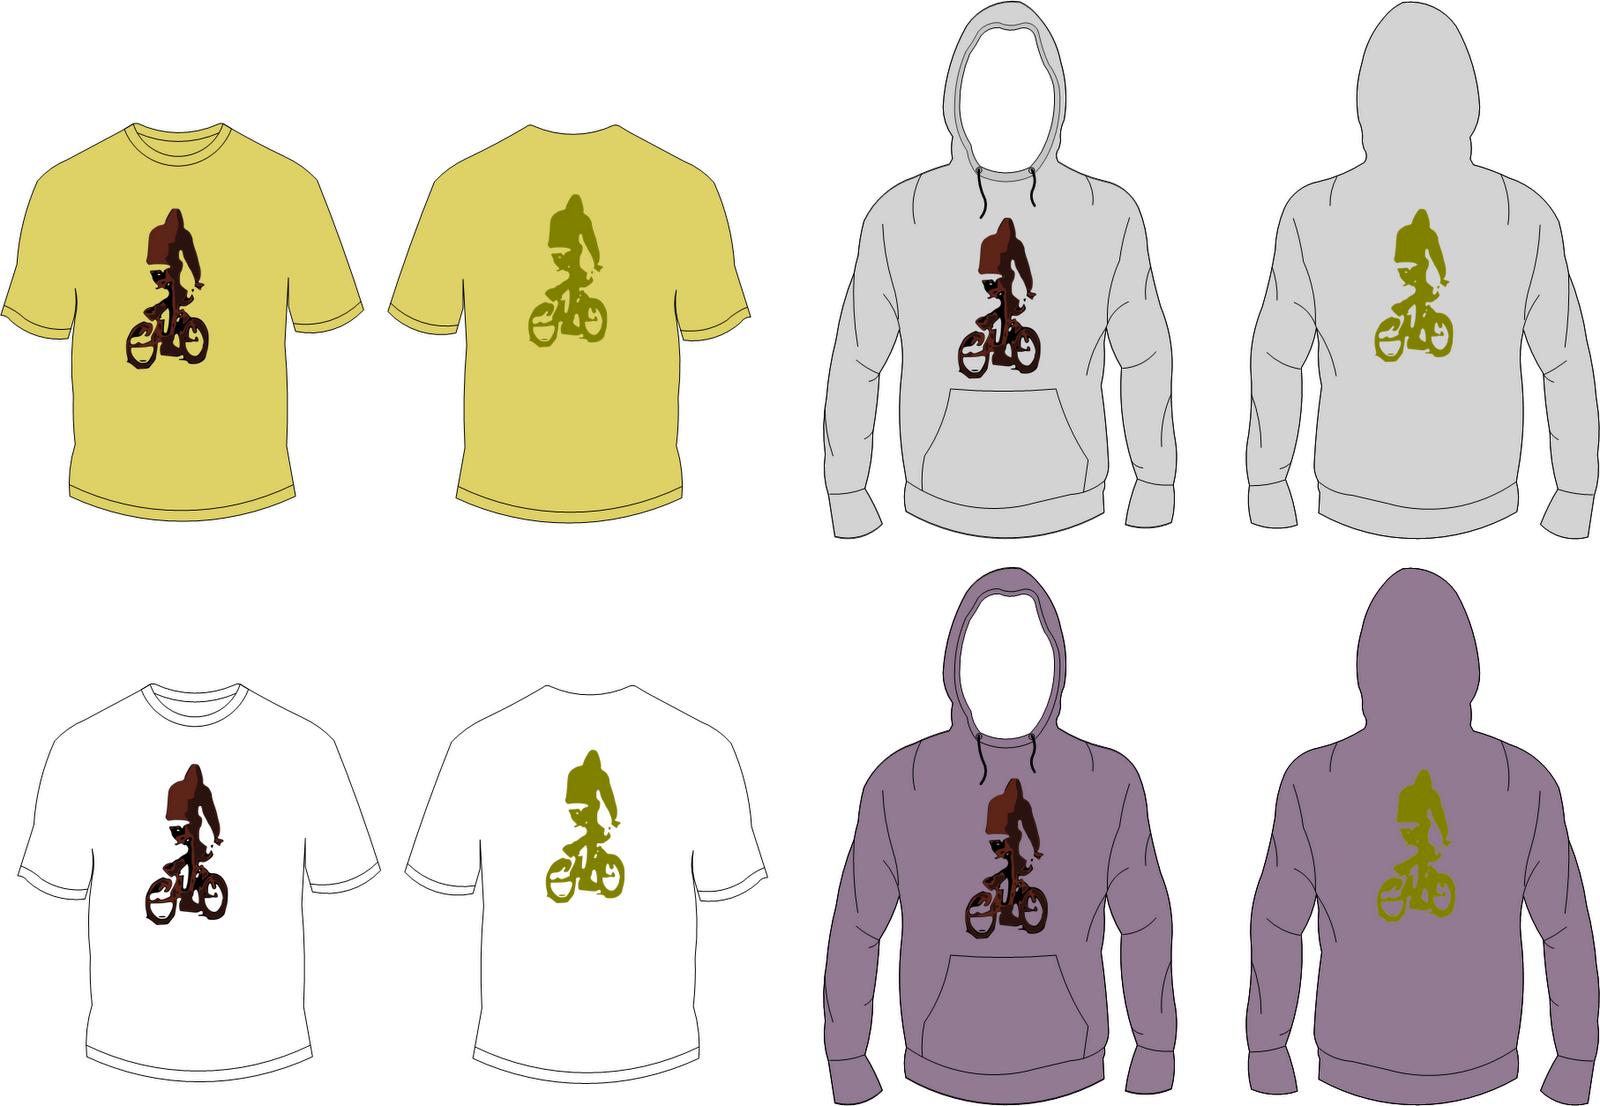 Shirt hoodie design - Shirt Hoodie Design 30